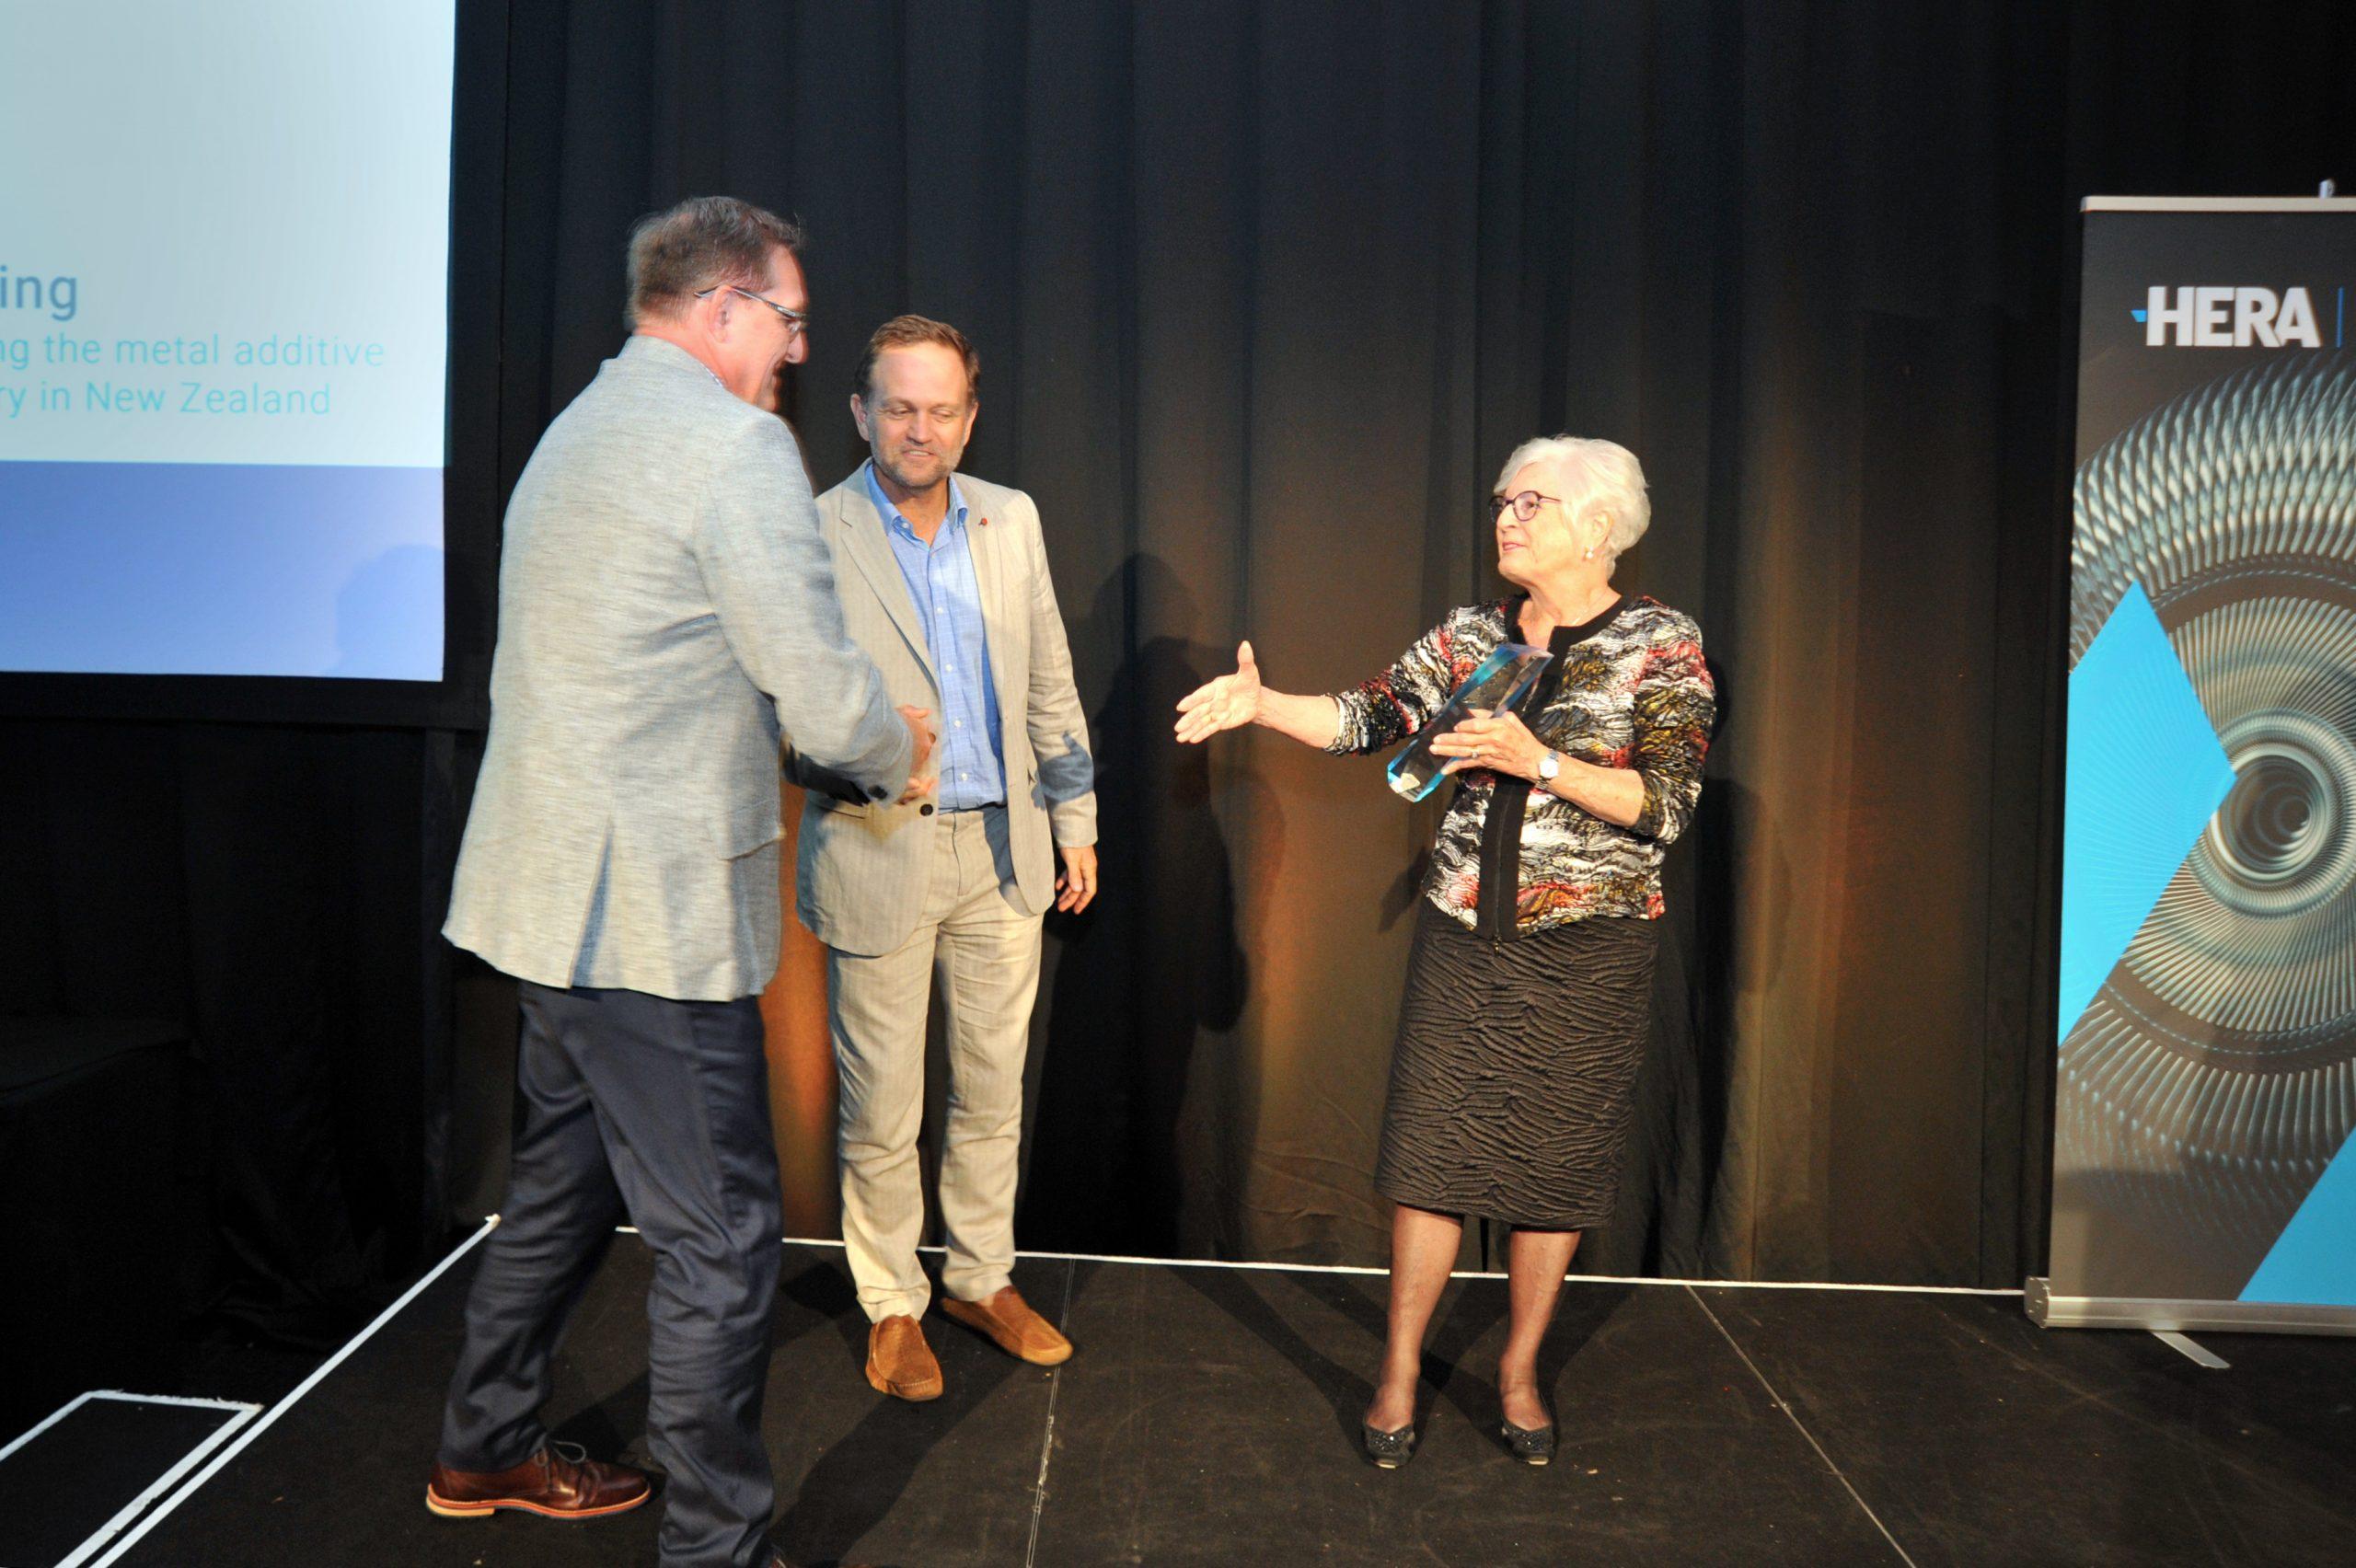 Awarding Keith Smith